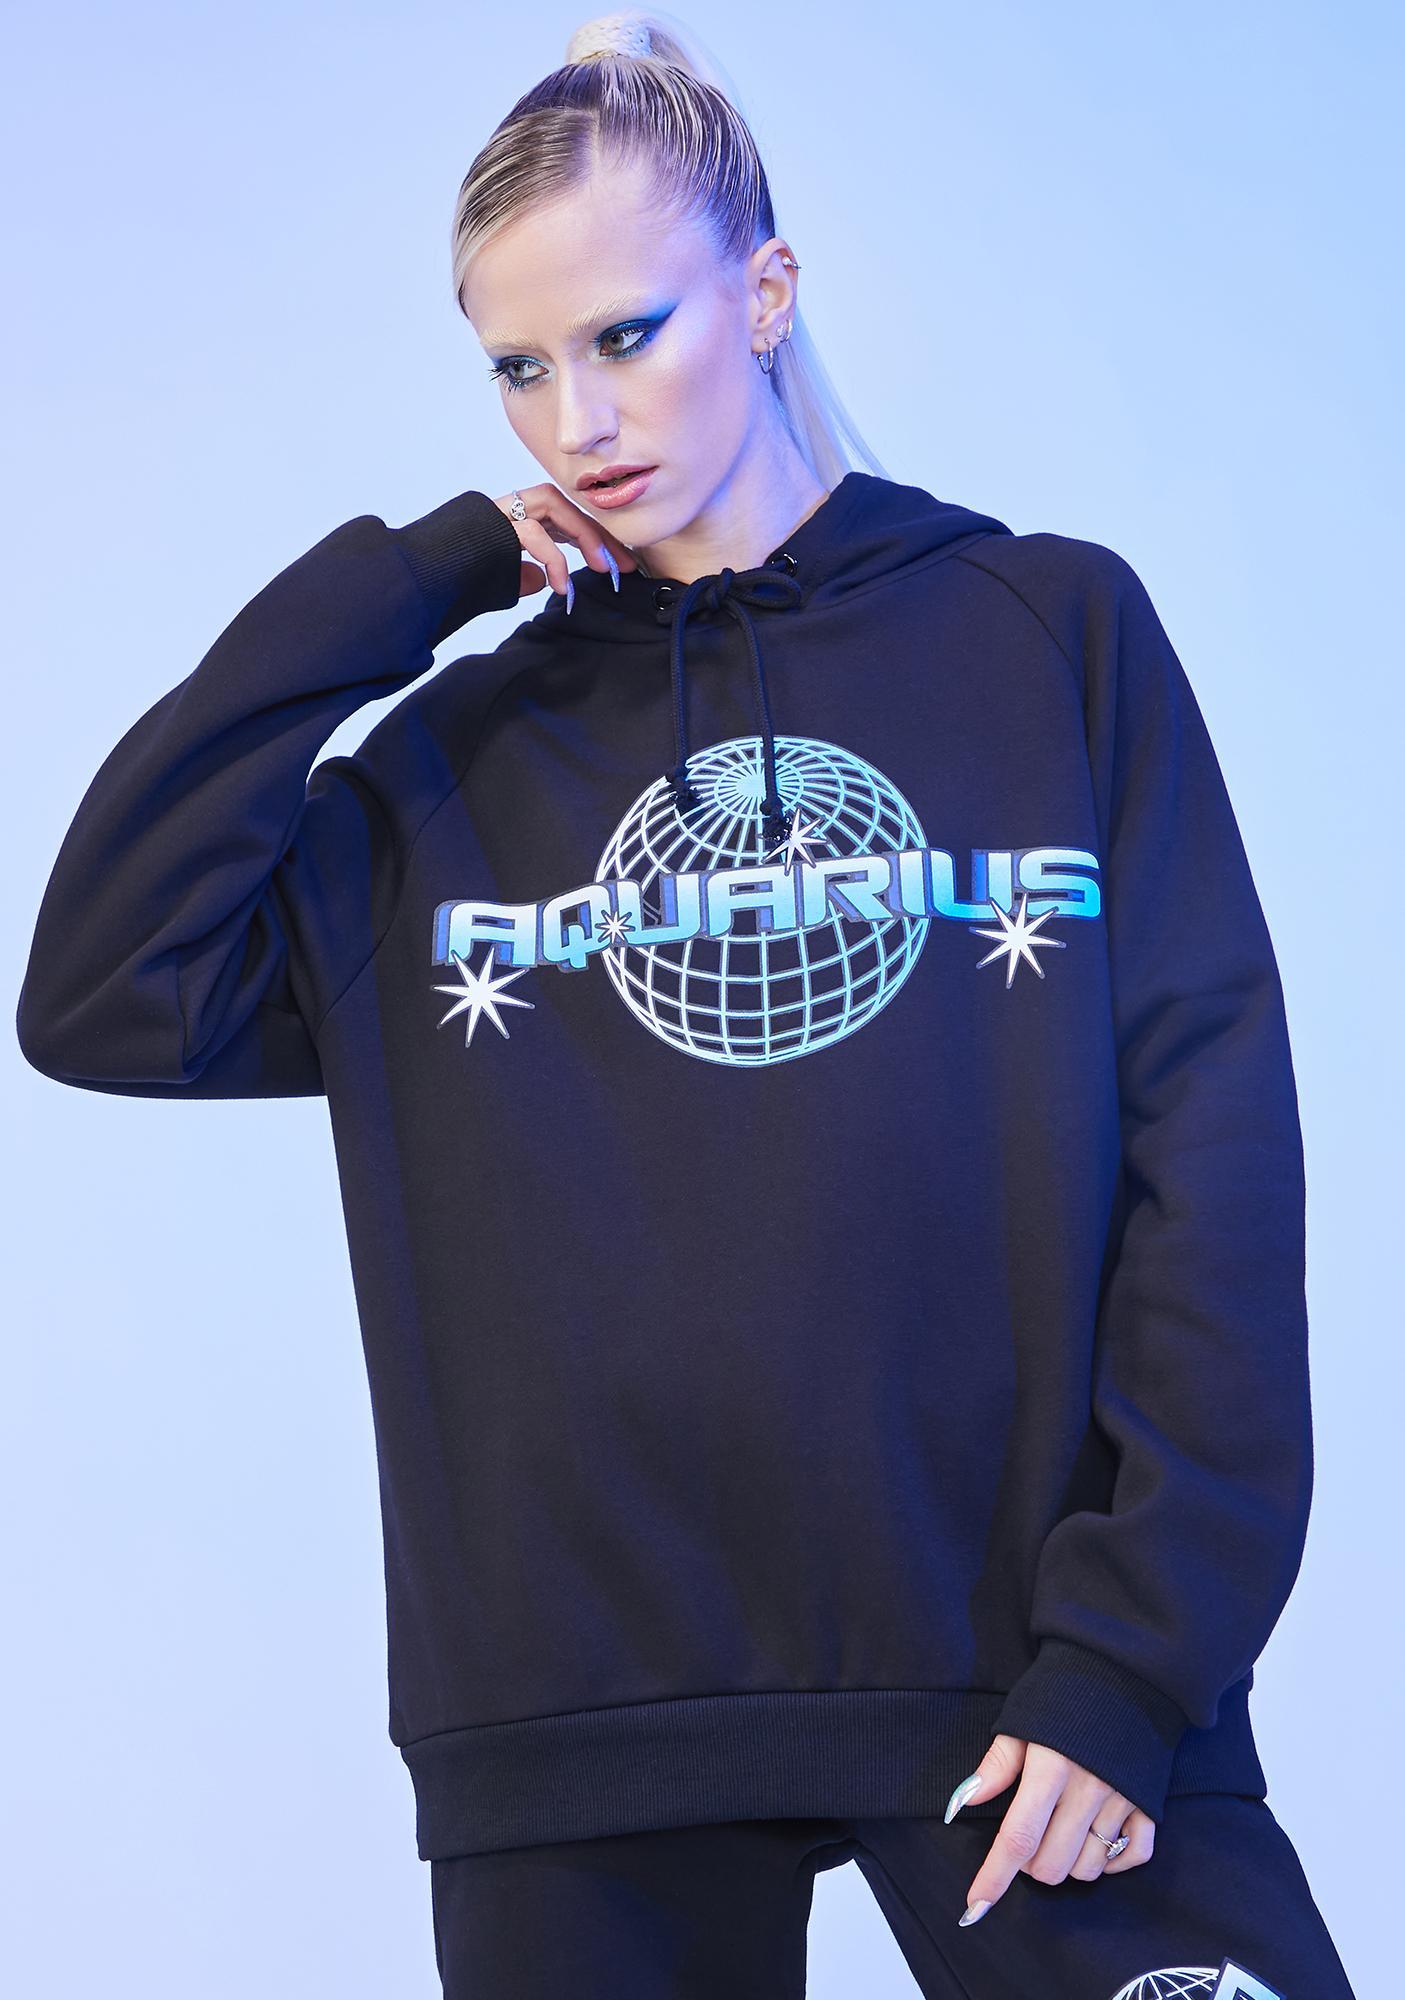 HOROSCOPEZ Aquarius Worldwide Graphic Hoodie